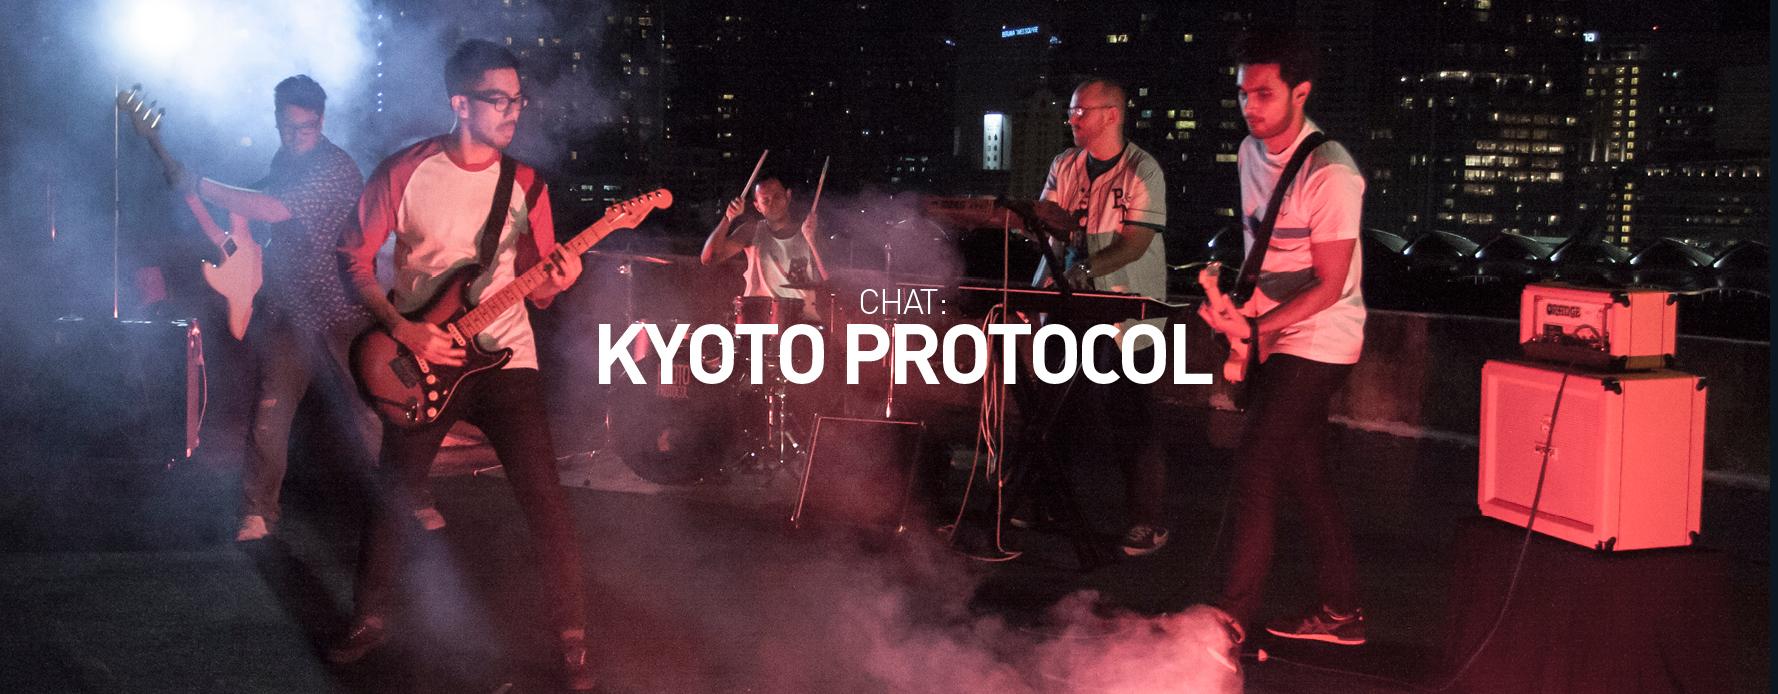 source: Kyoto Protocol